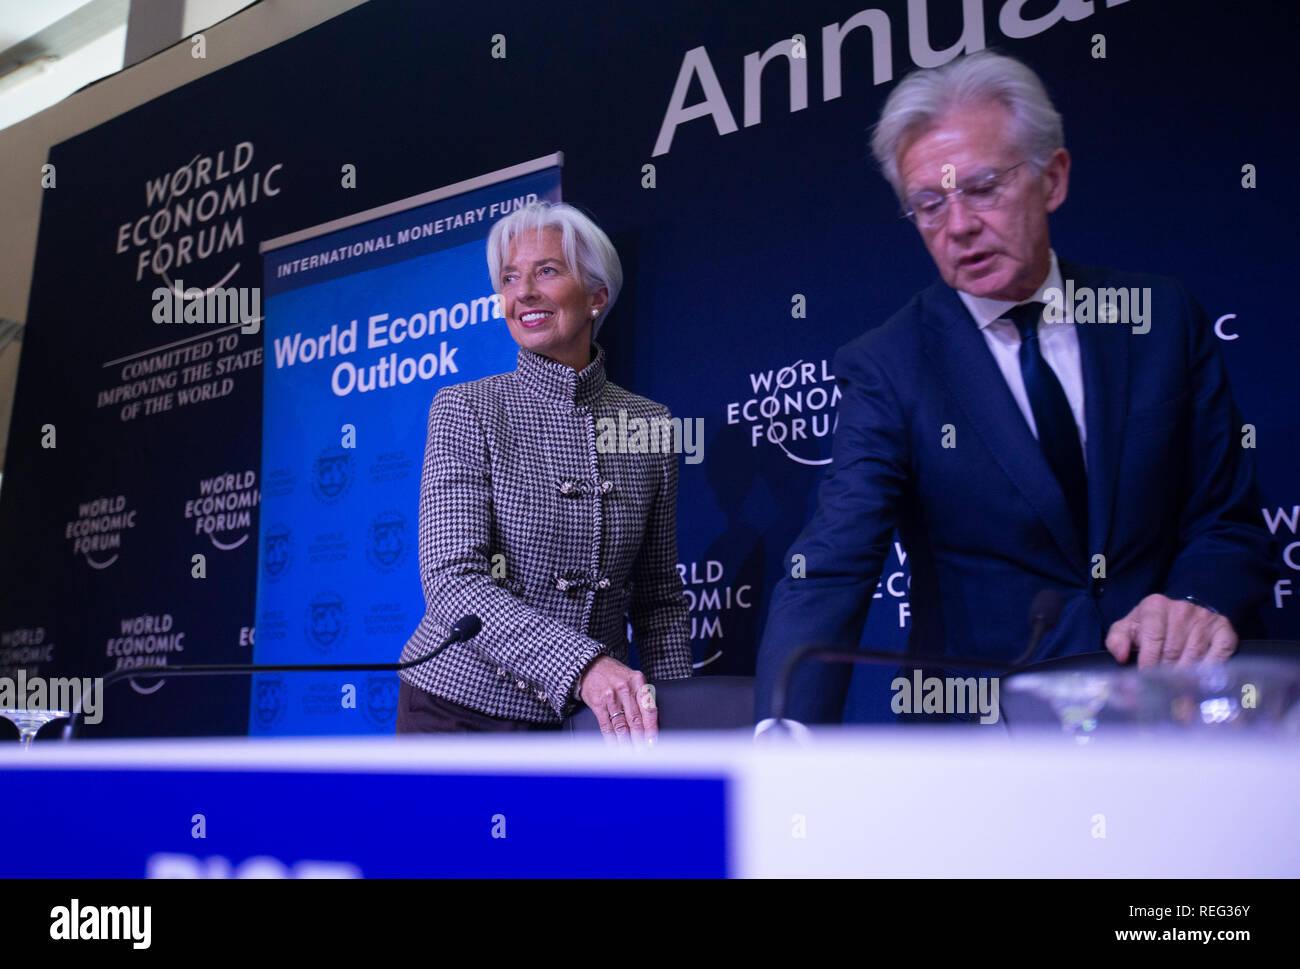 Davos, Switzerland  21st Jan, 2019  International Monetary